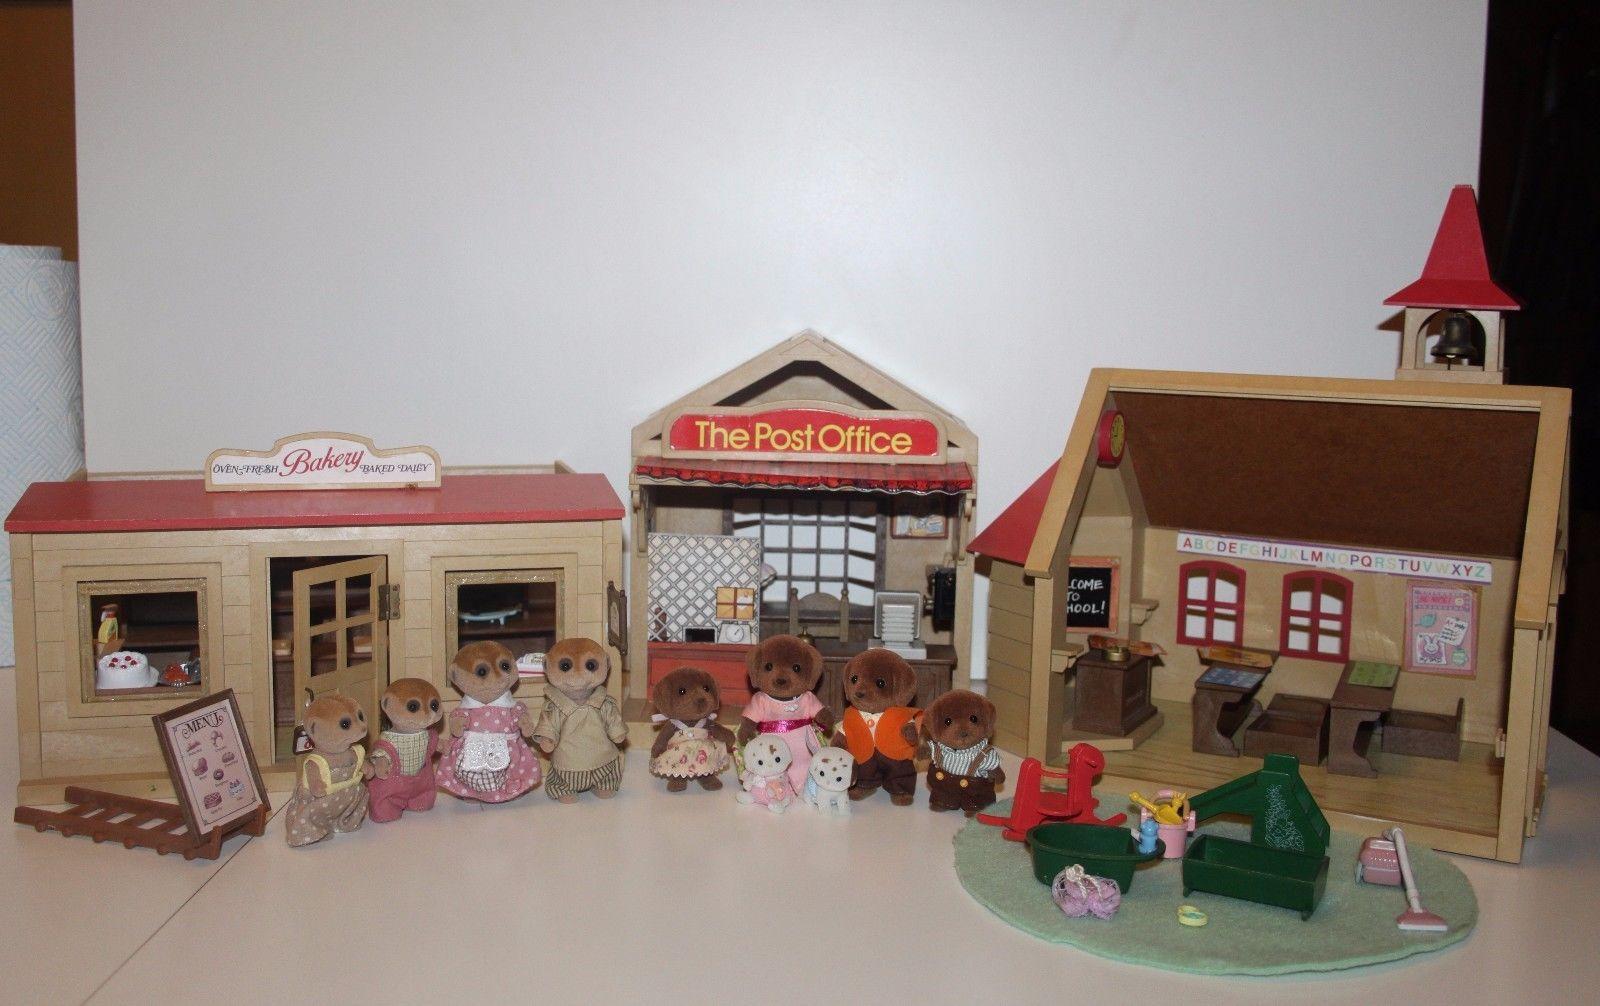 Sylvanian Families Bakerychurch Schoolpost Officefigures